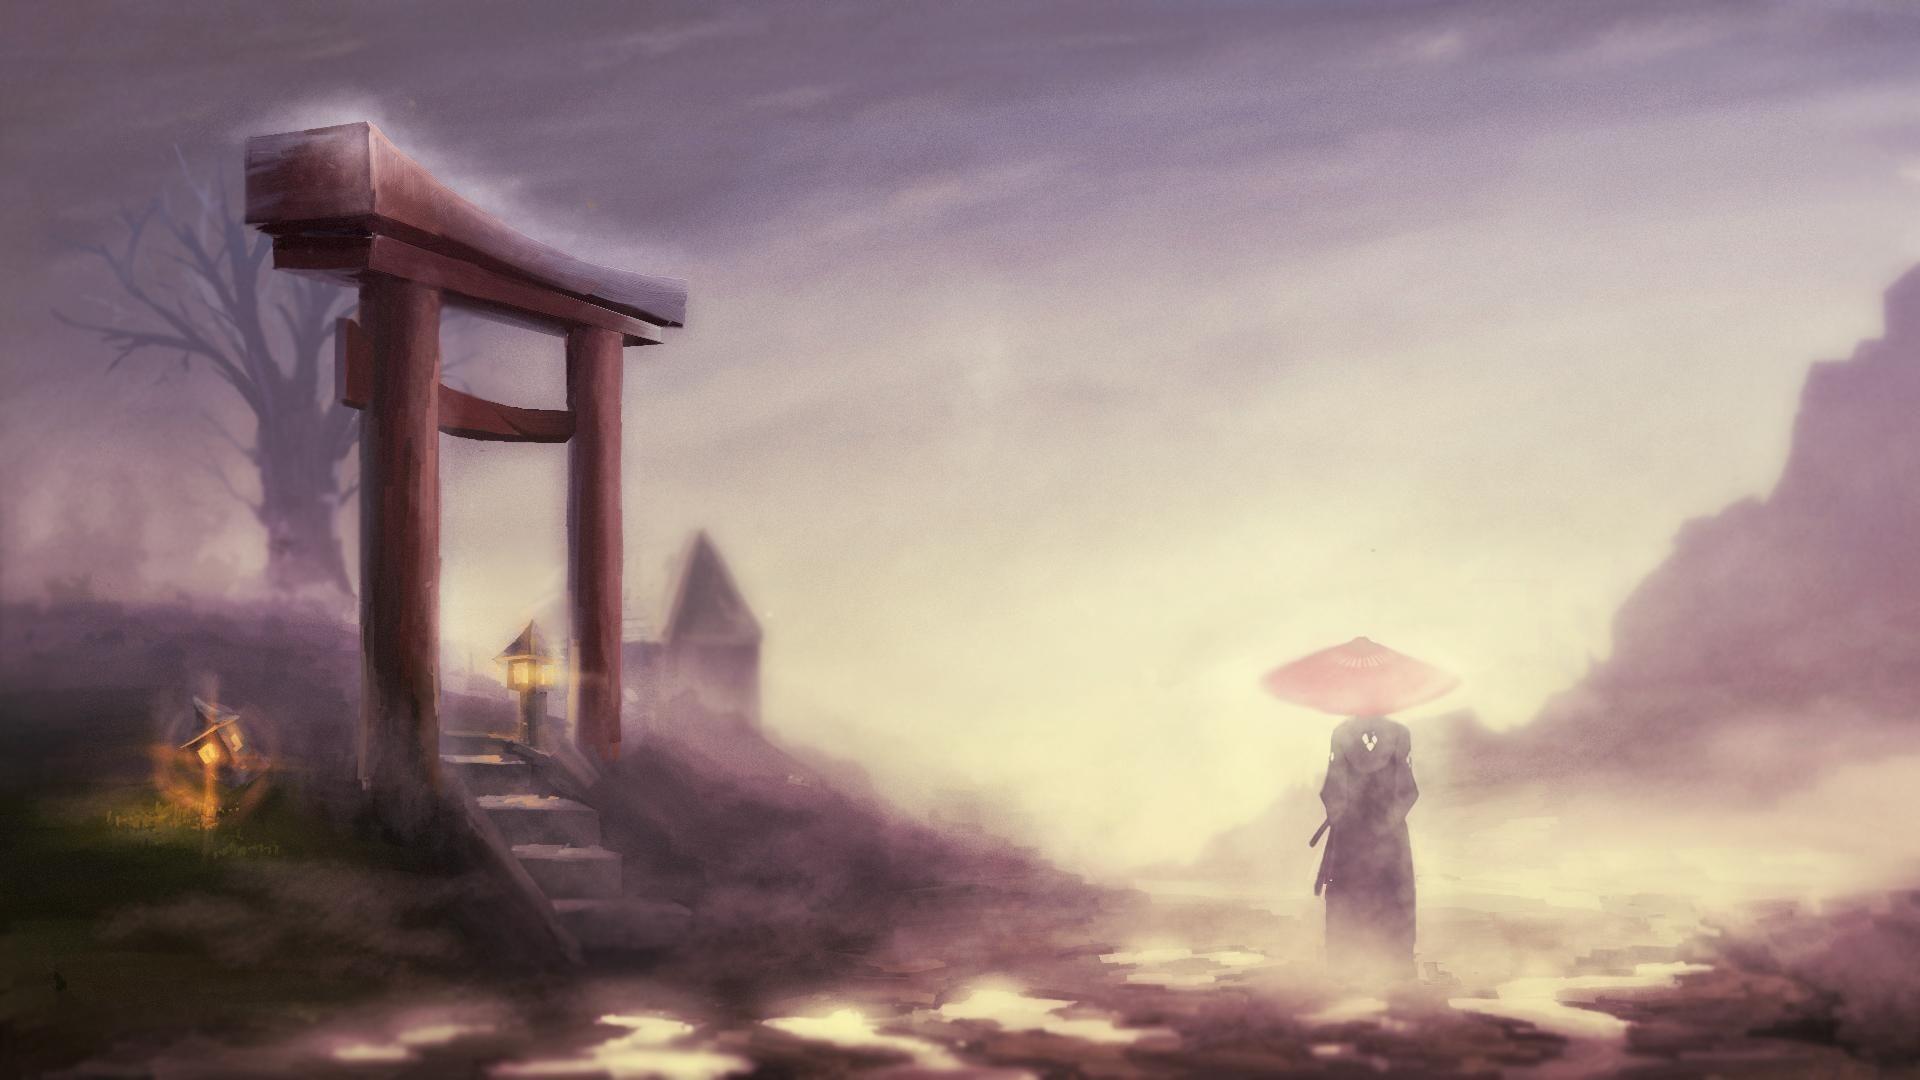 SAMURAI CHAMPLOO WALLPAPER – (#42154) – HD Wallpapers .